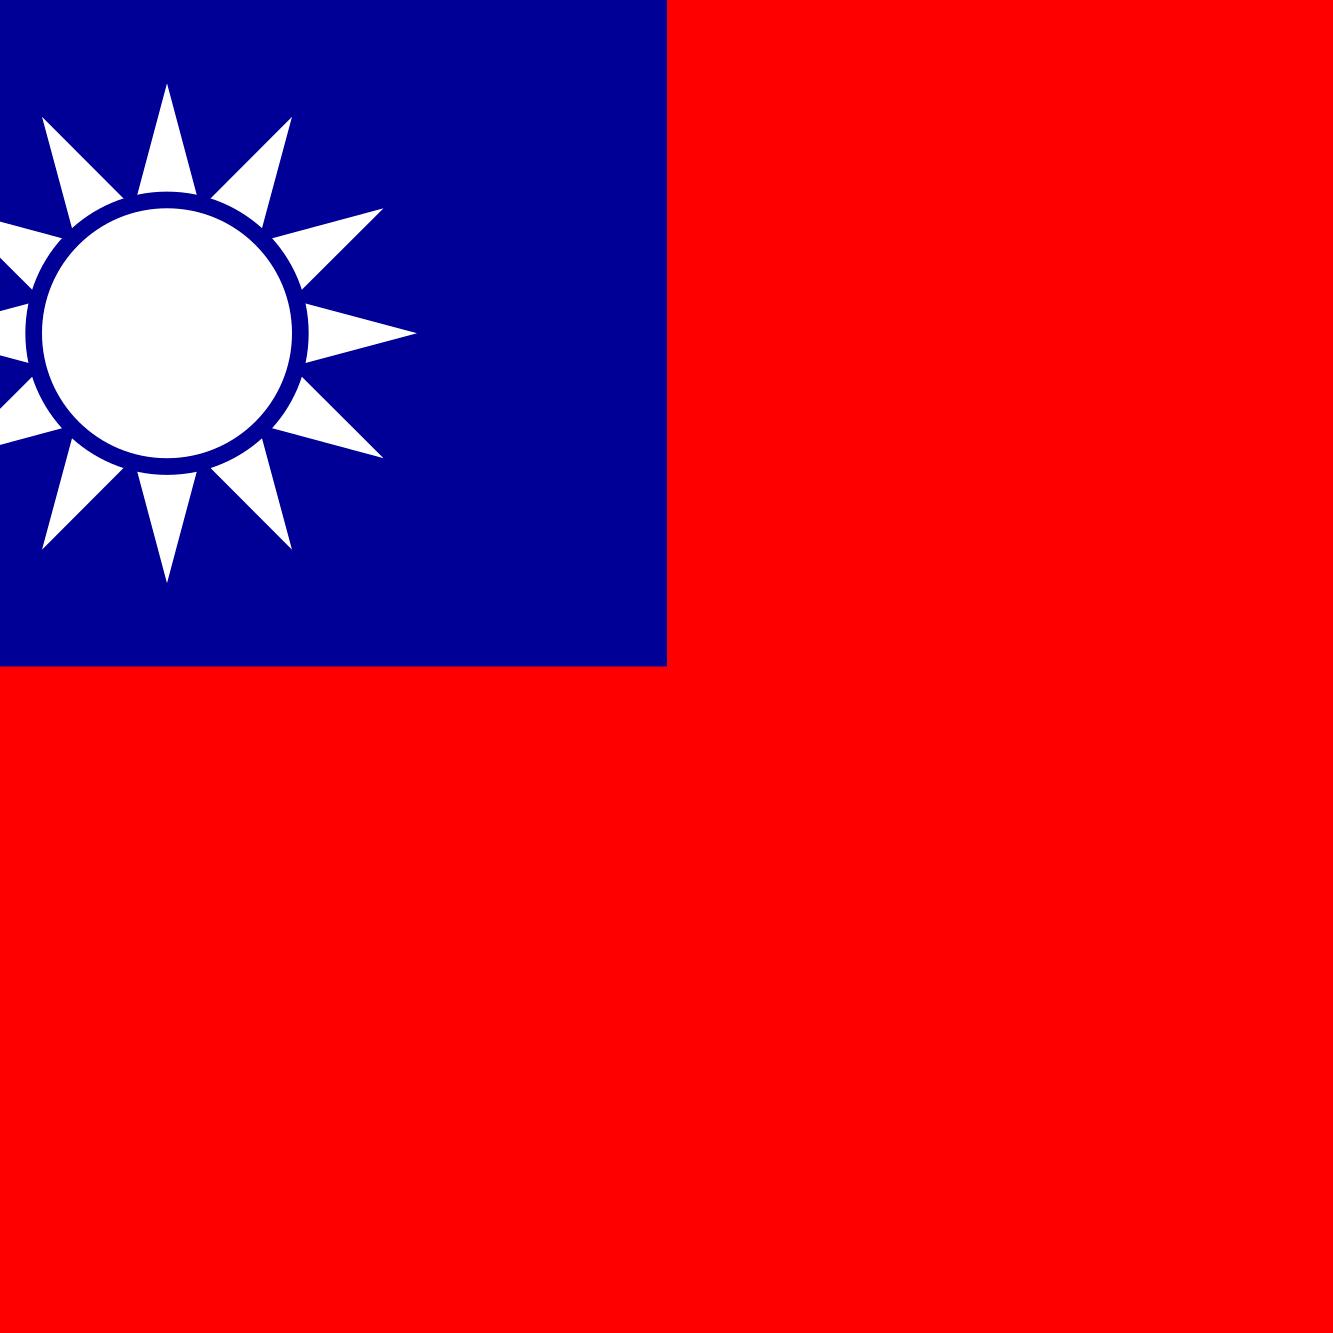 Colonel Li Chiang